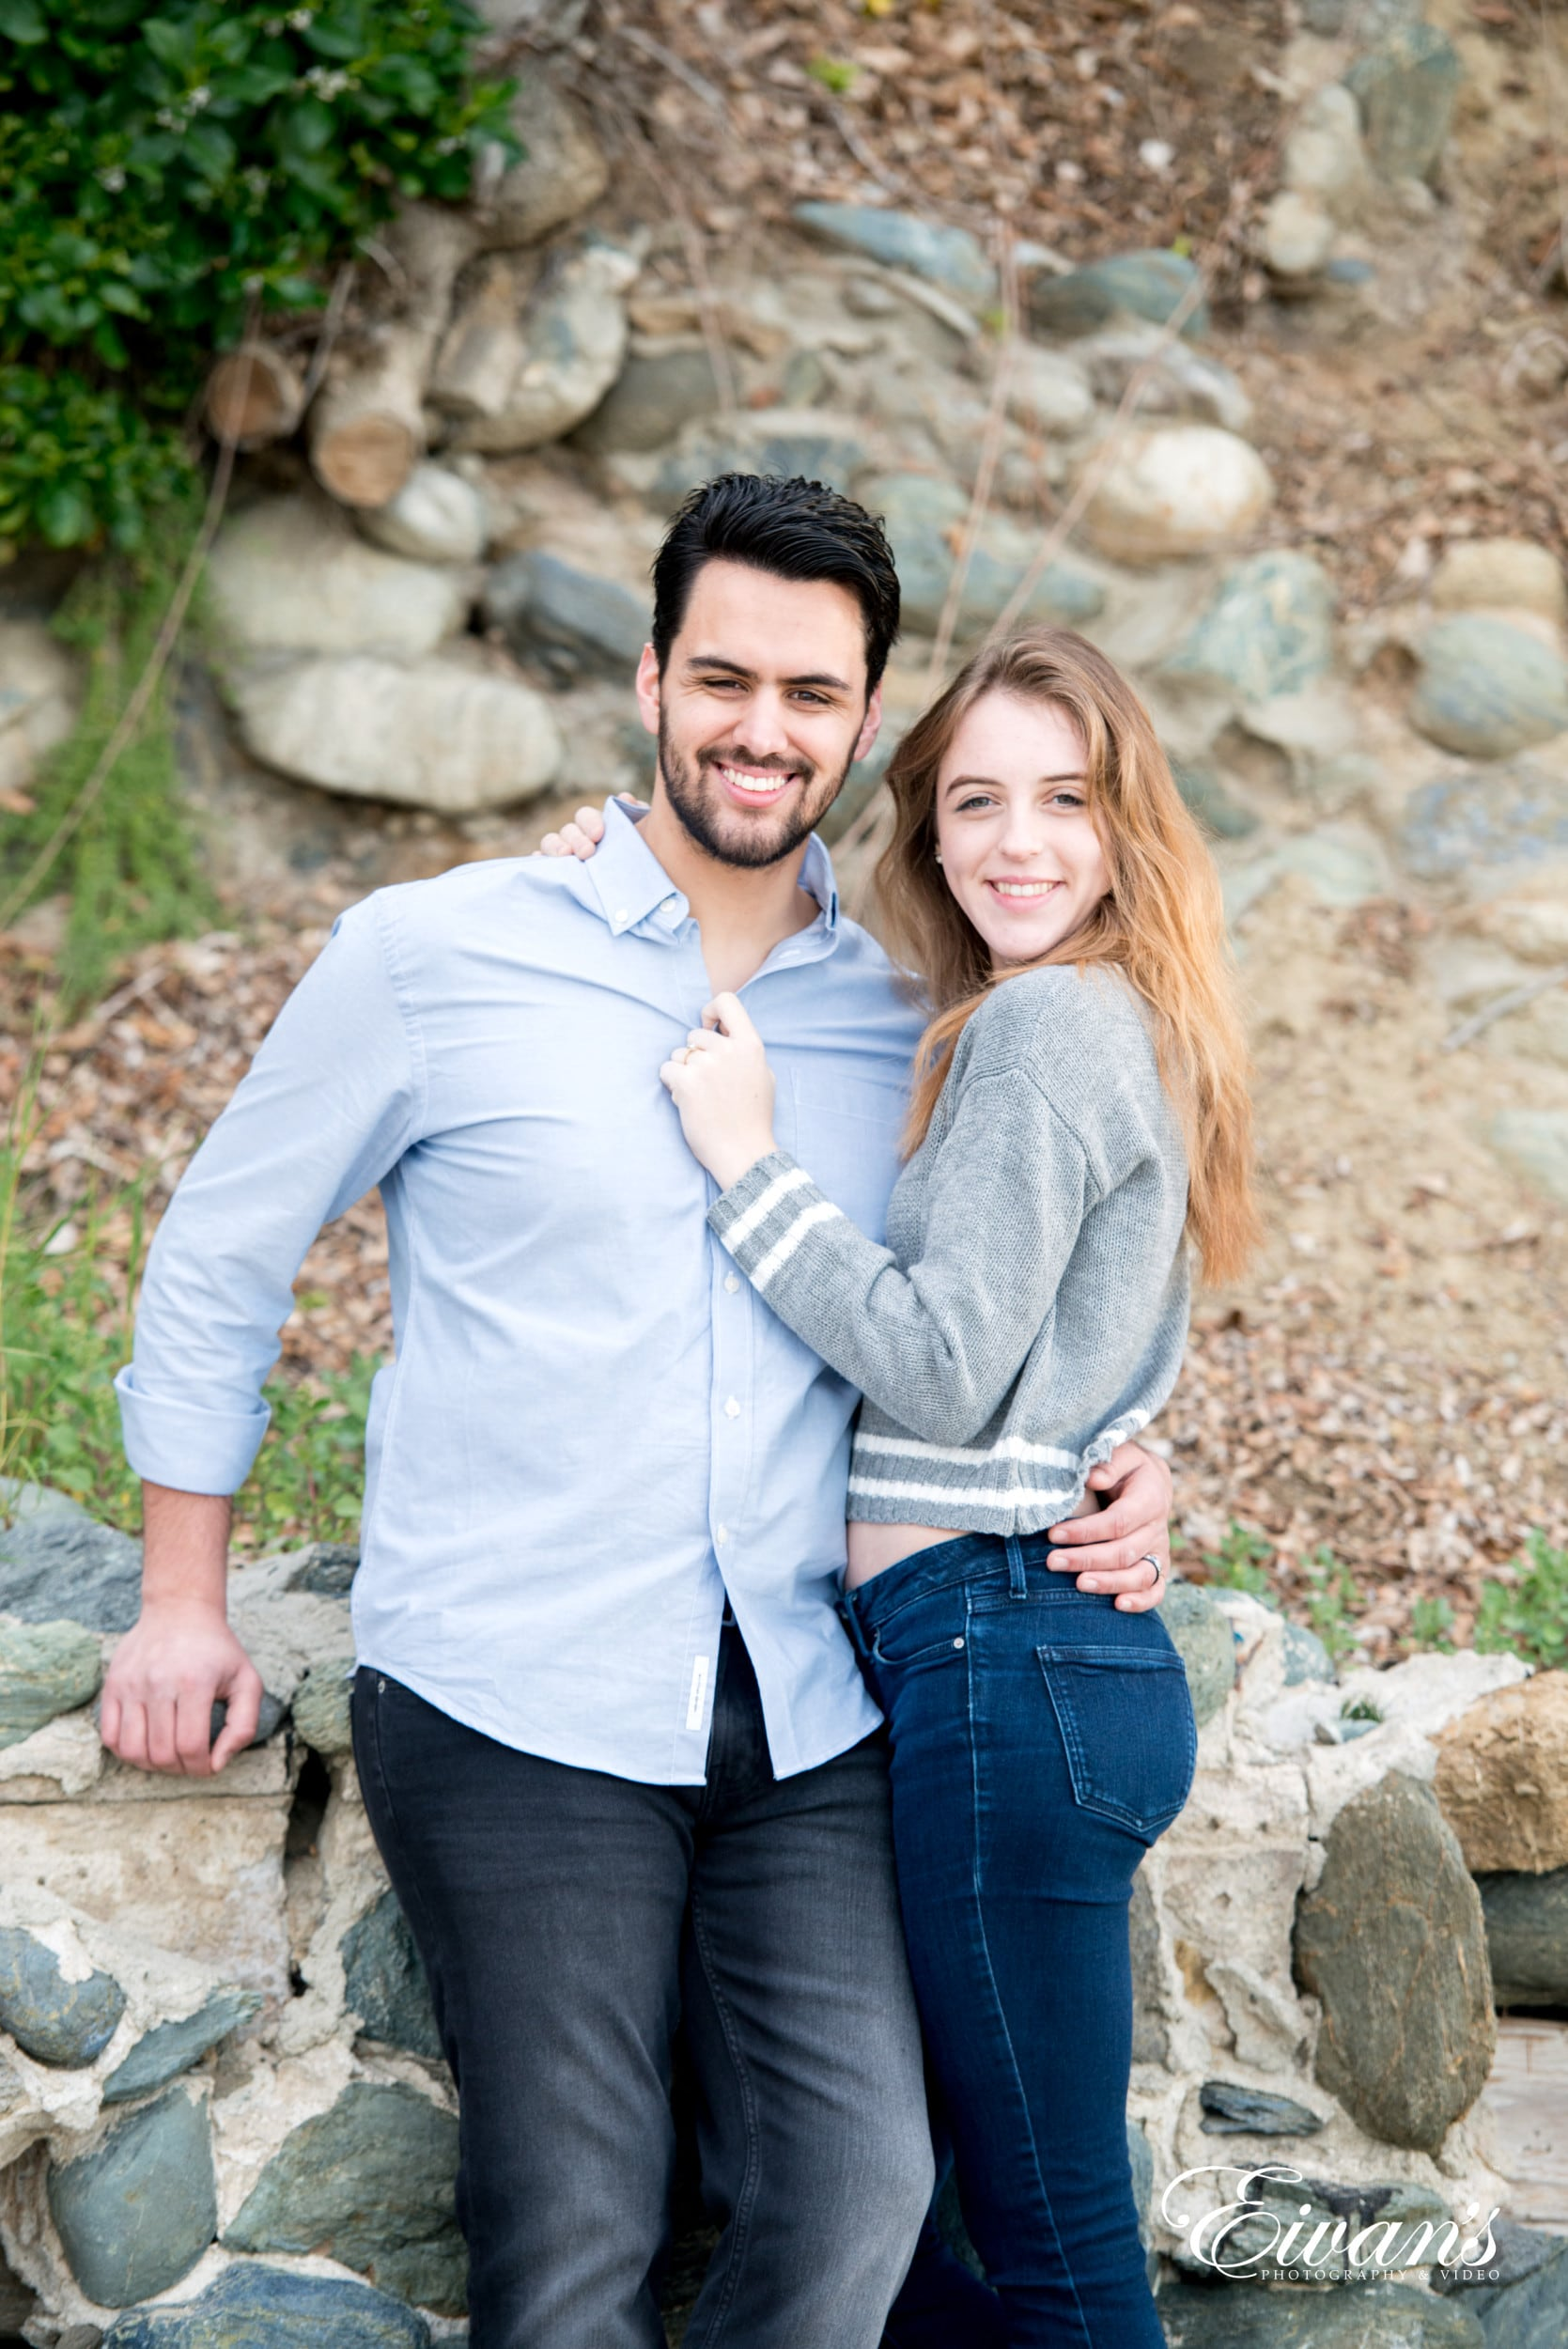 man in gray dress shirt hugging woman in blue denim jeans